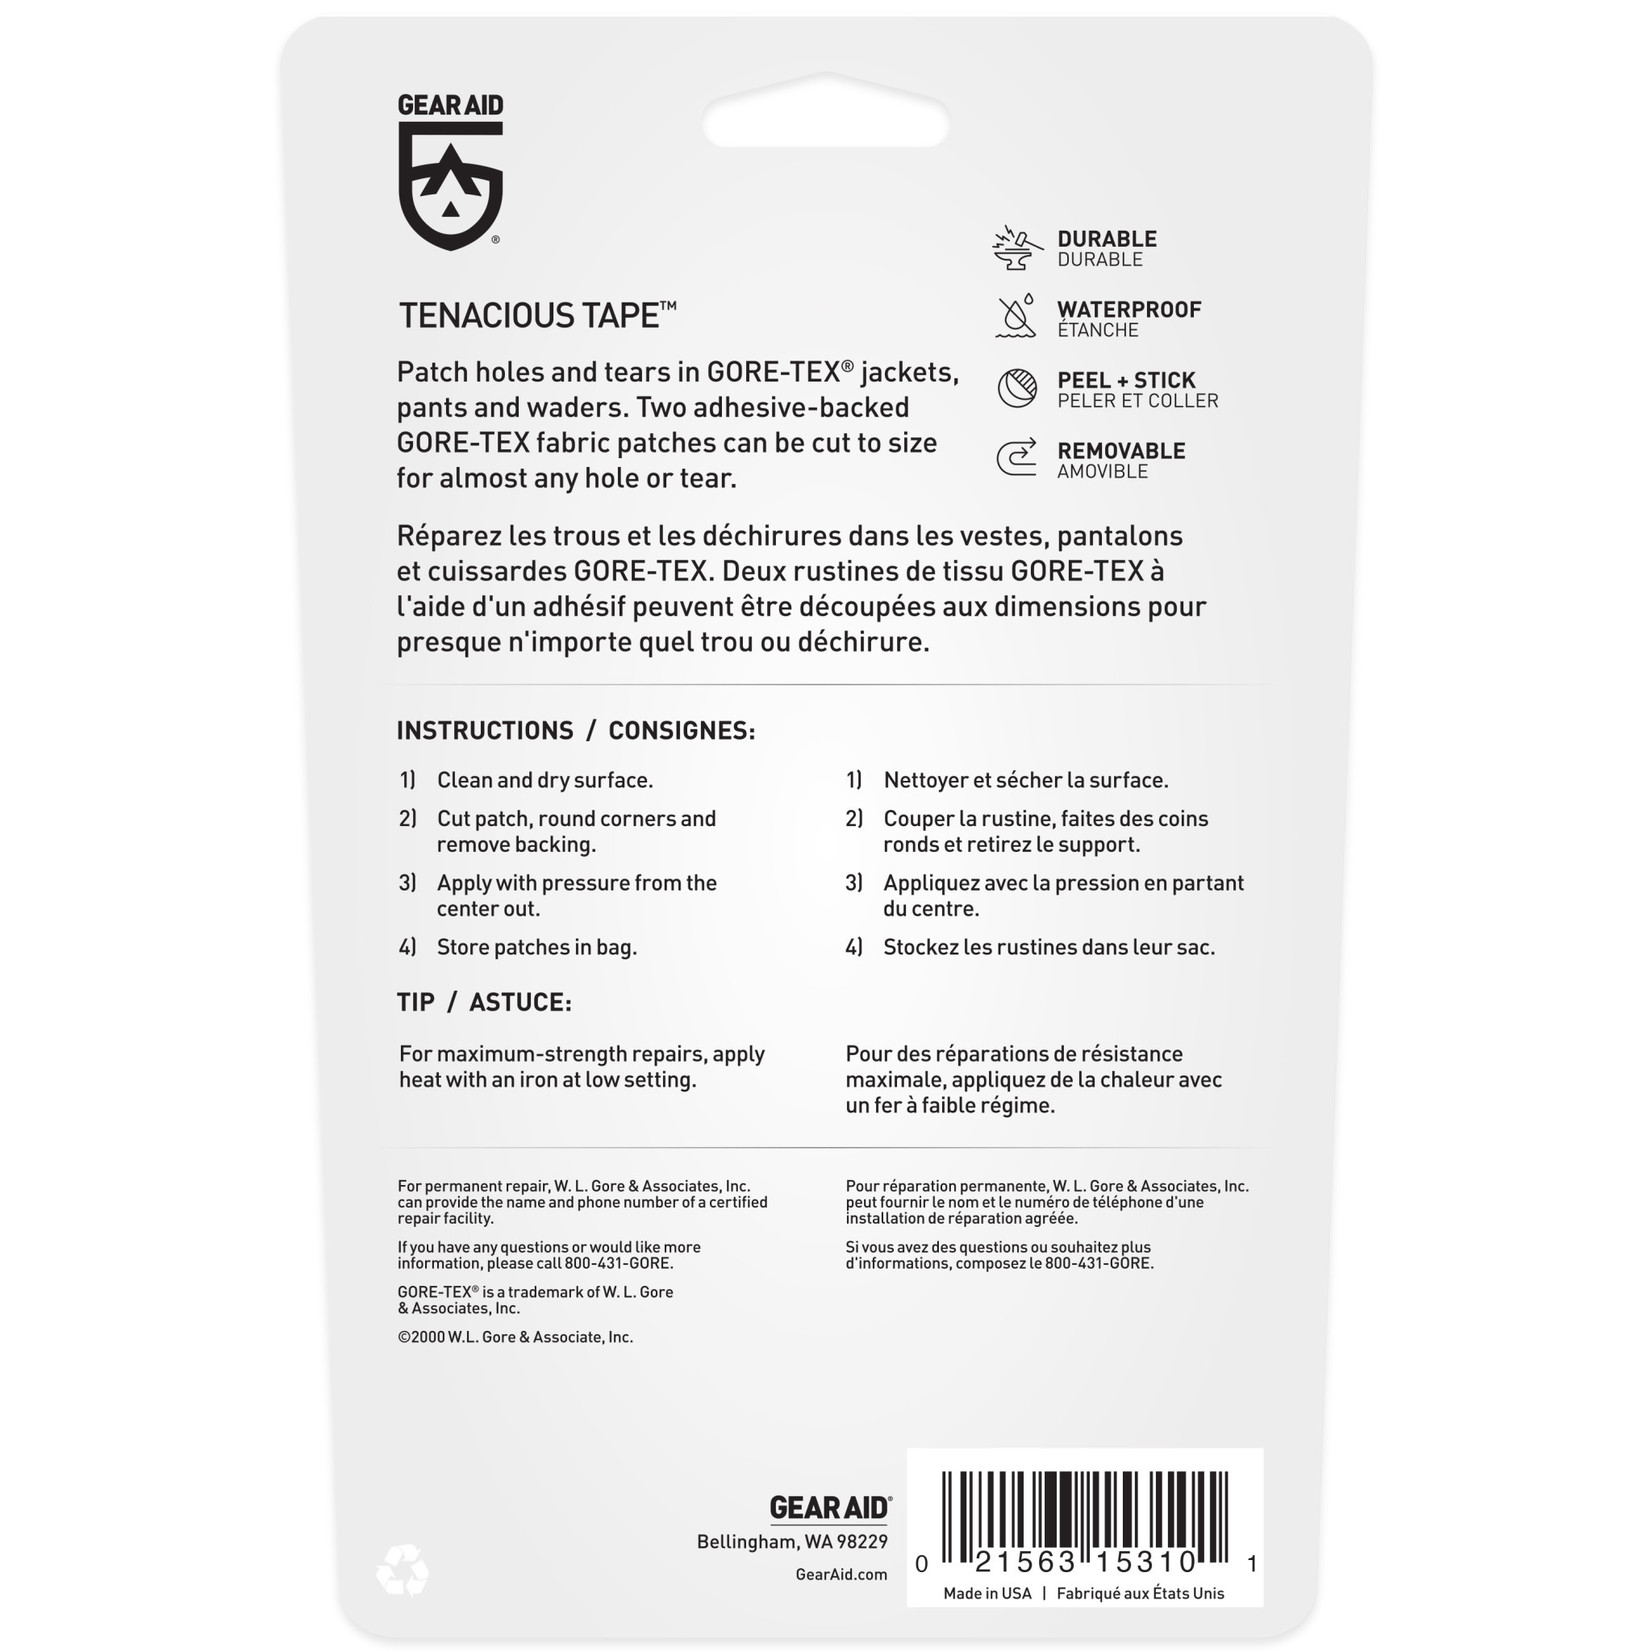 Gear Aid TEN GORE-TEX PATCHES